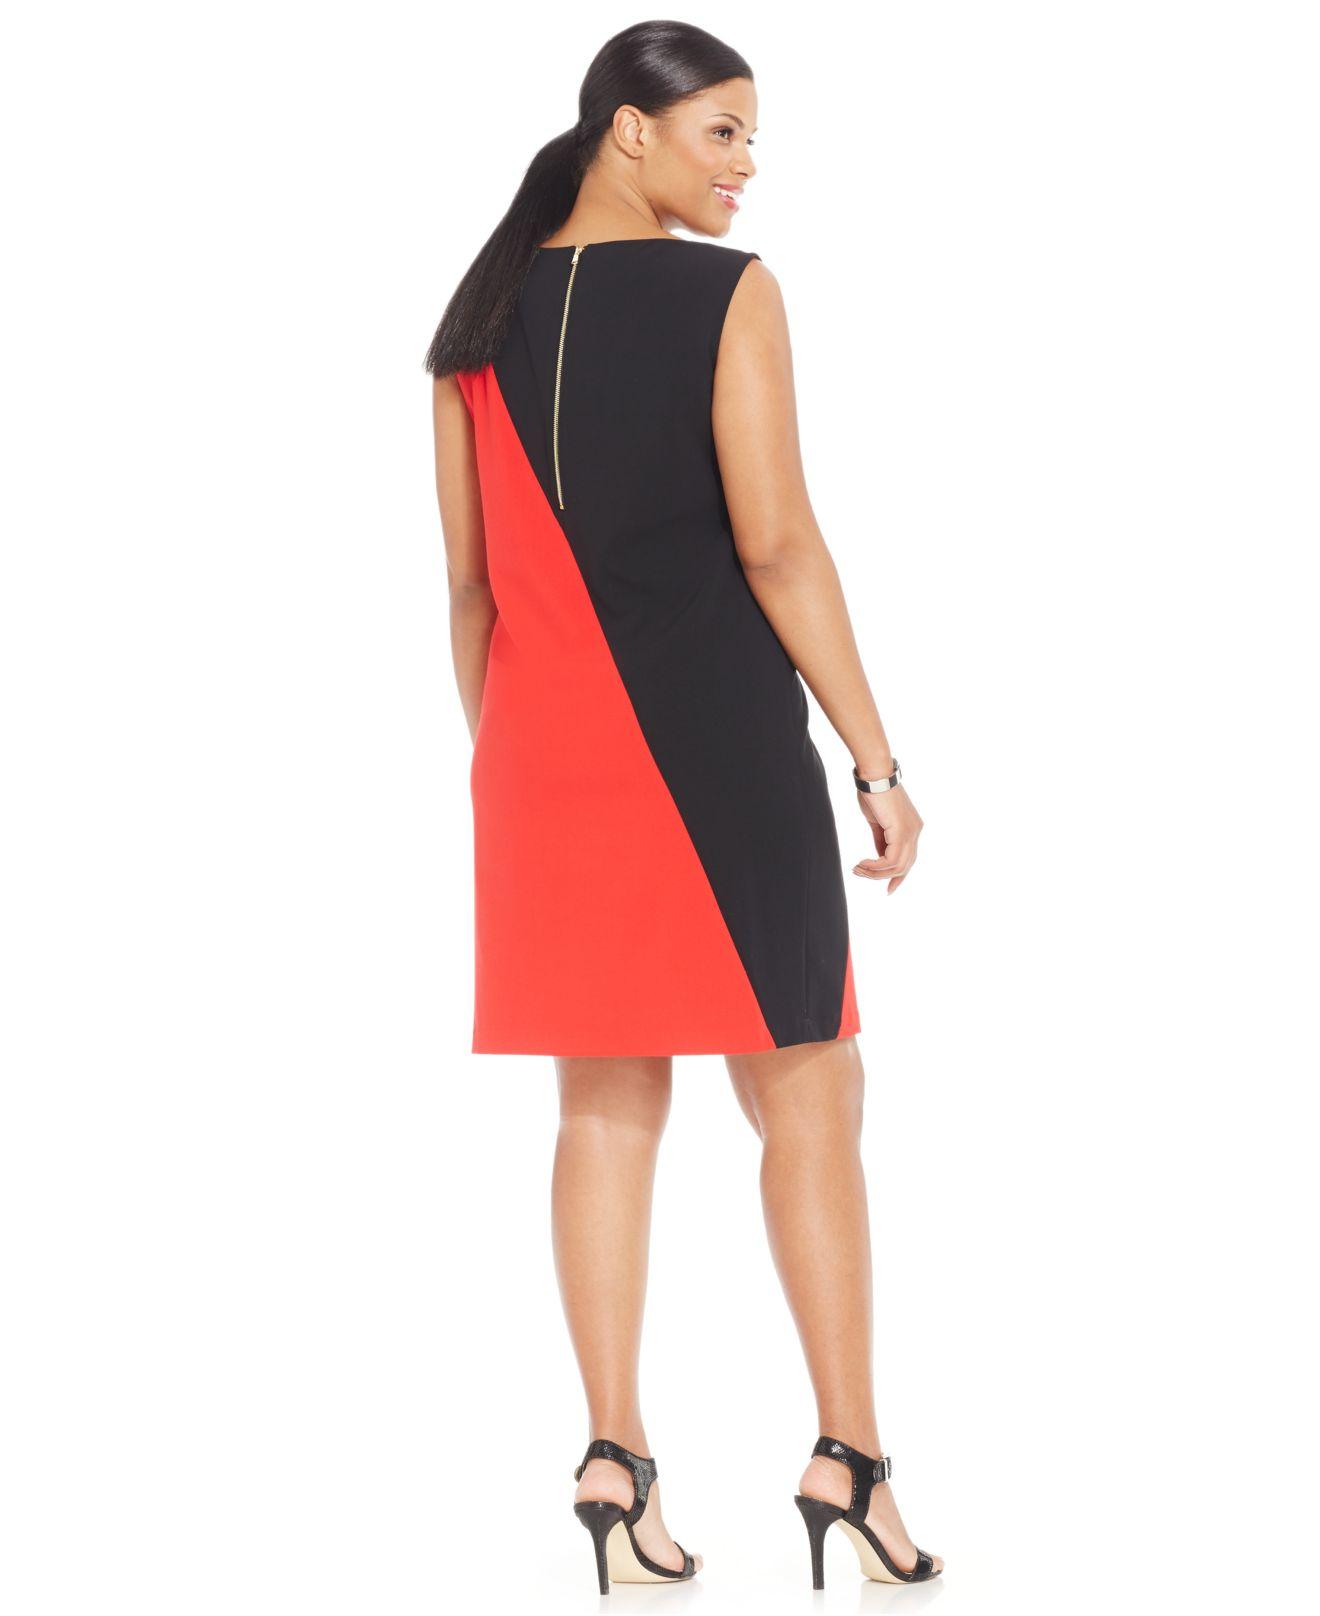 Nine West Red Plus Size Sleeveless Colorblock Sheath Dress